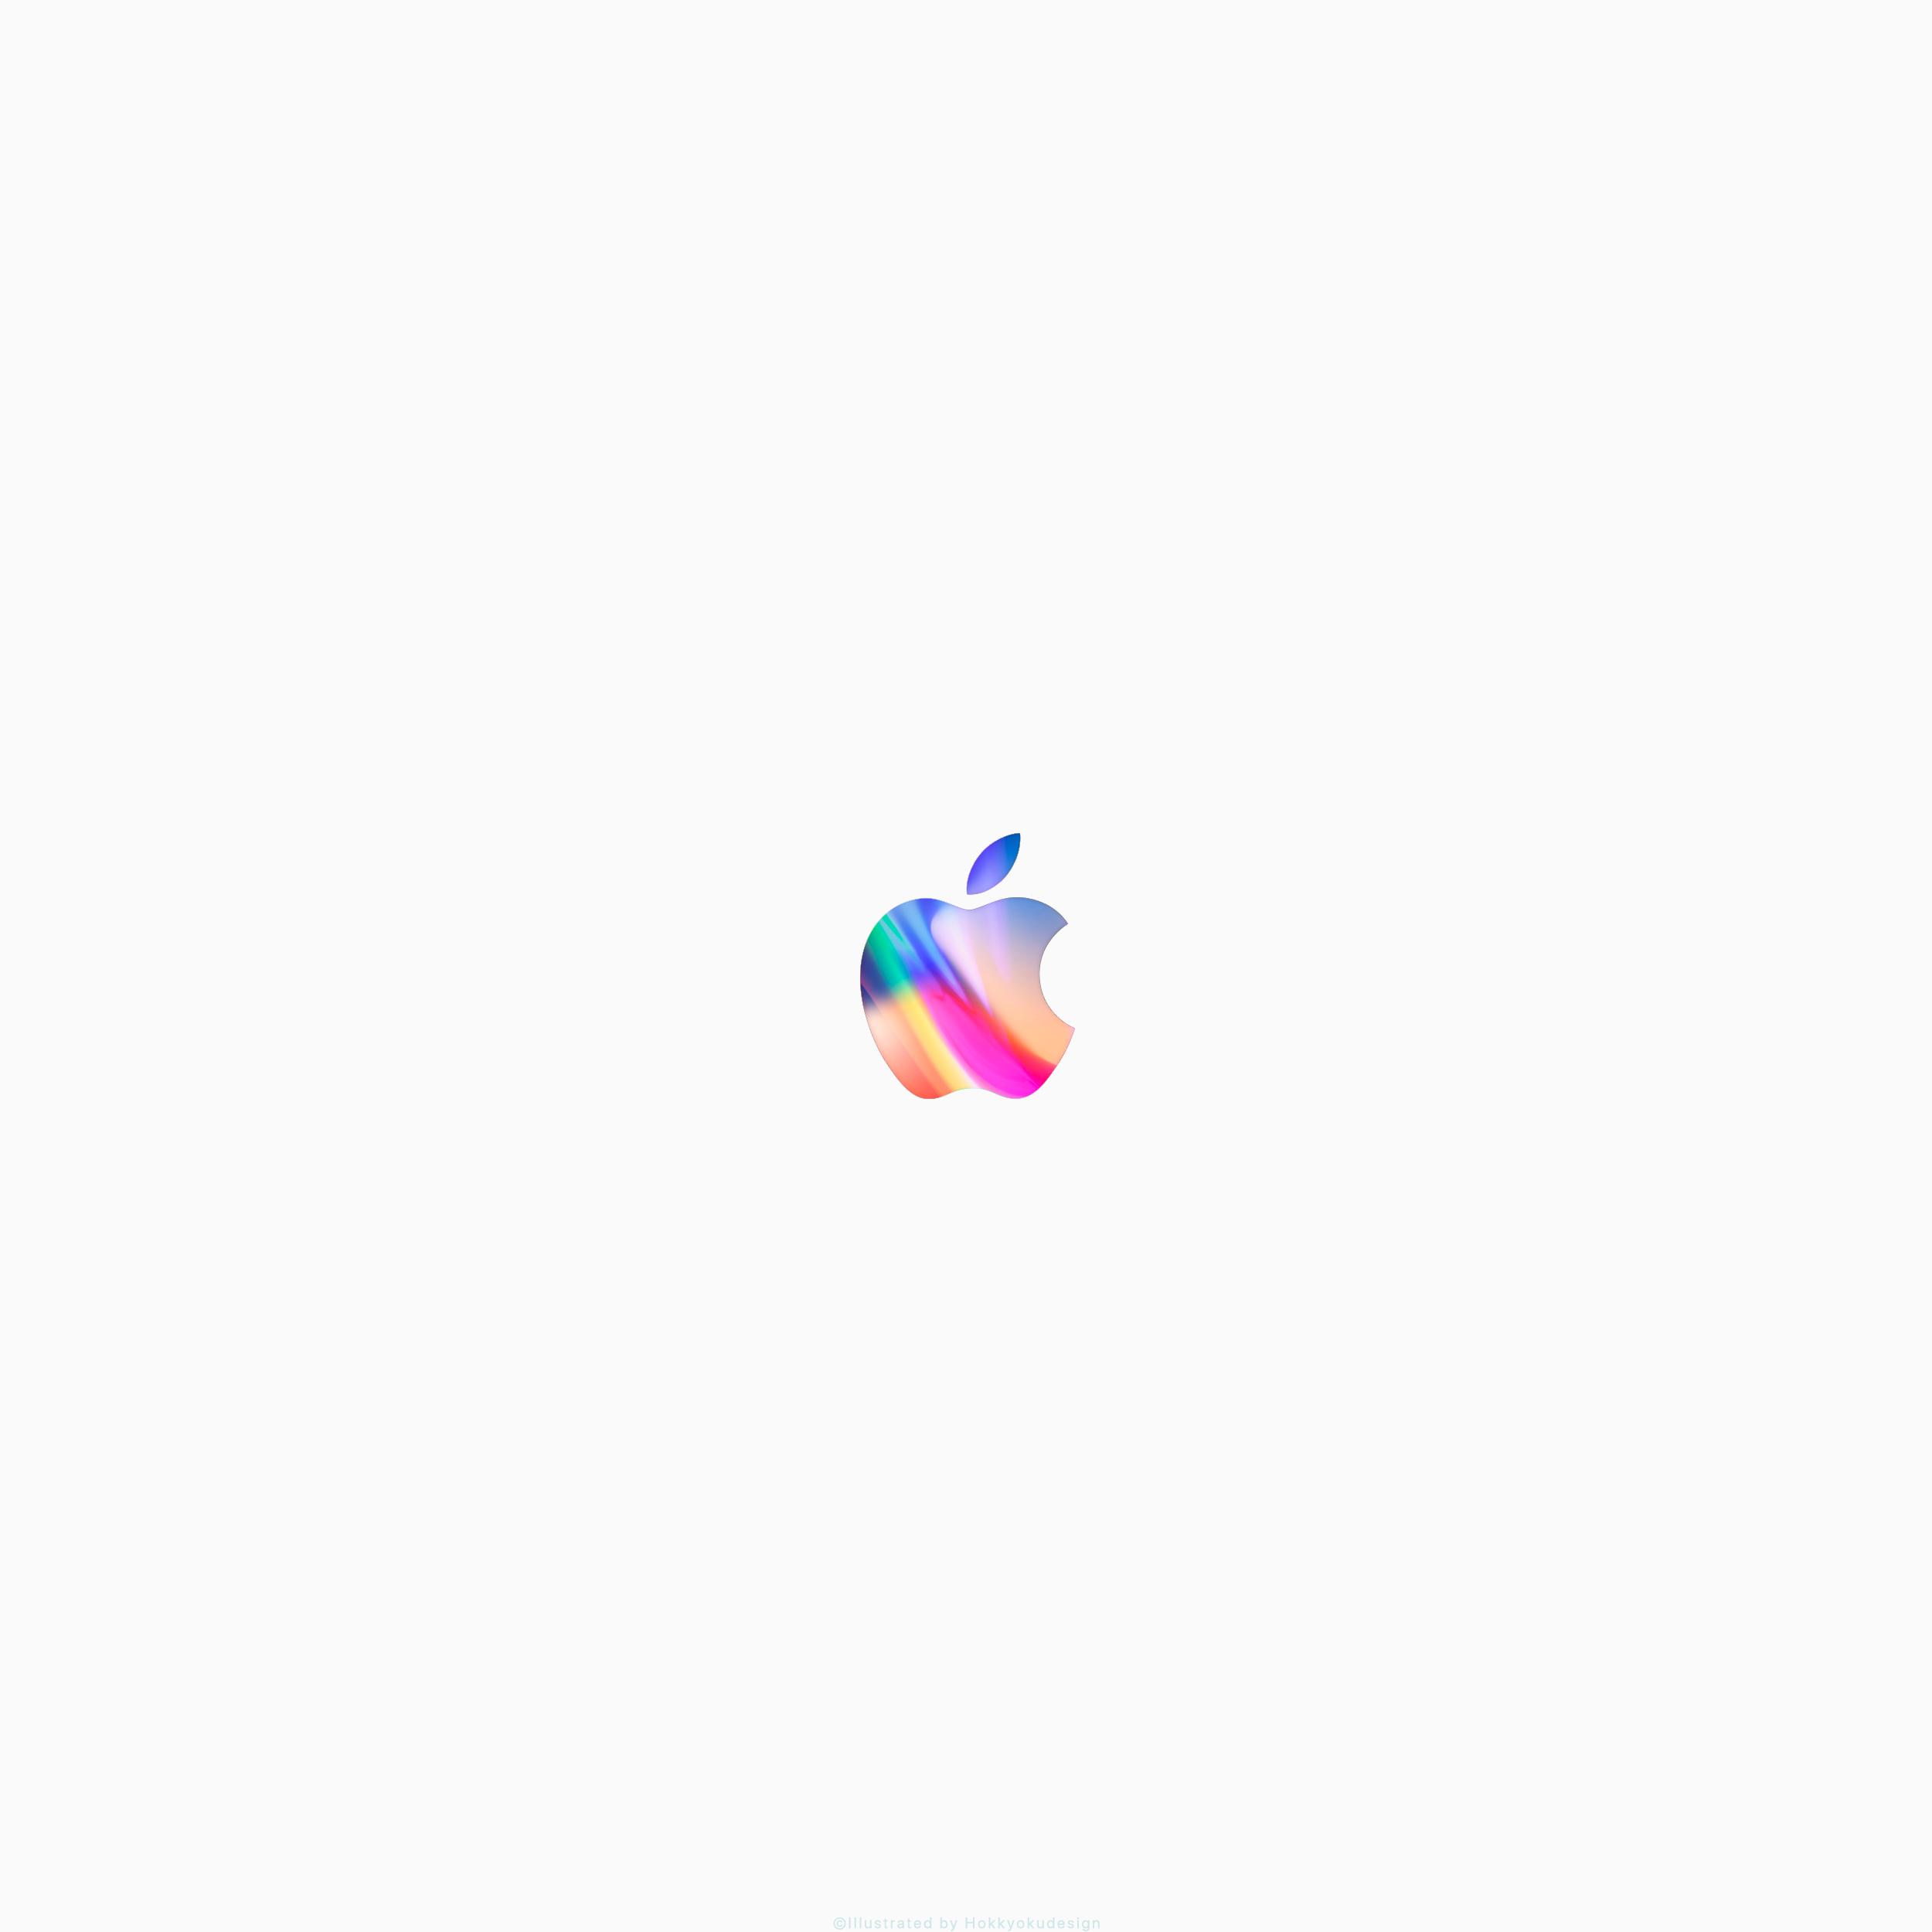 Iphone X 8 8plusと全iphone壁紙 Appleマーク3 Apple Wallpaper For